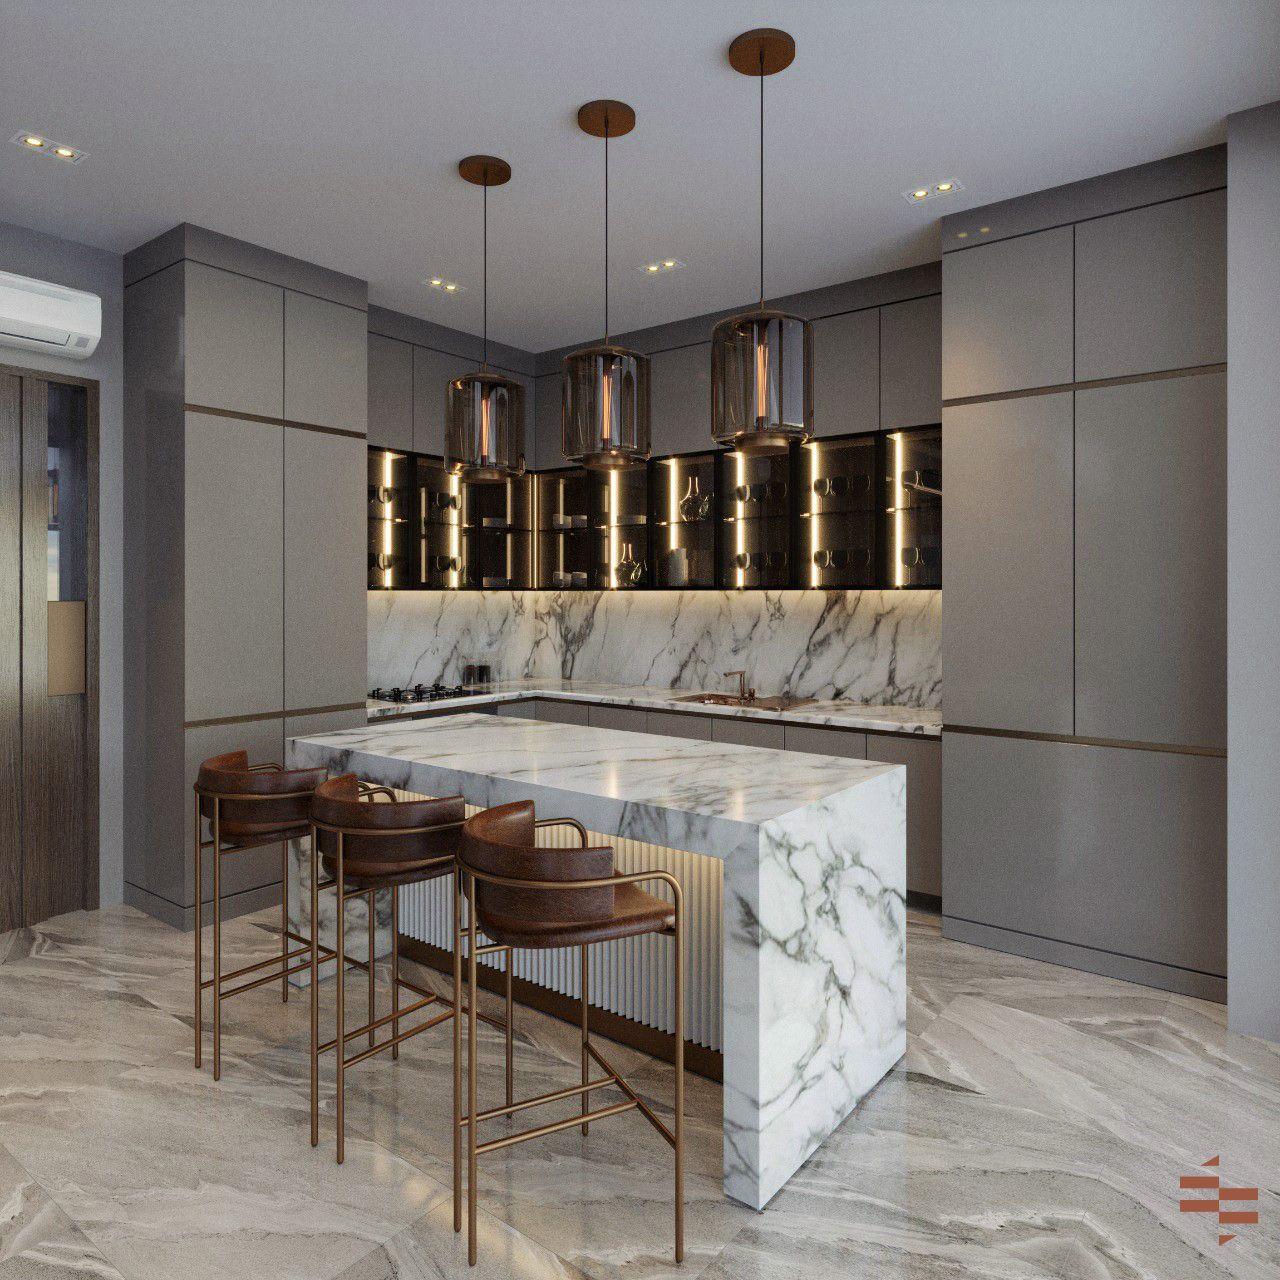 Residential Interior Design: Pin On Residential Interior Design